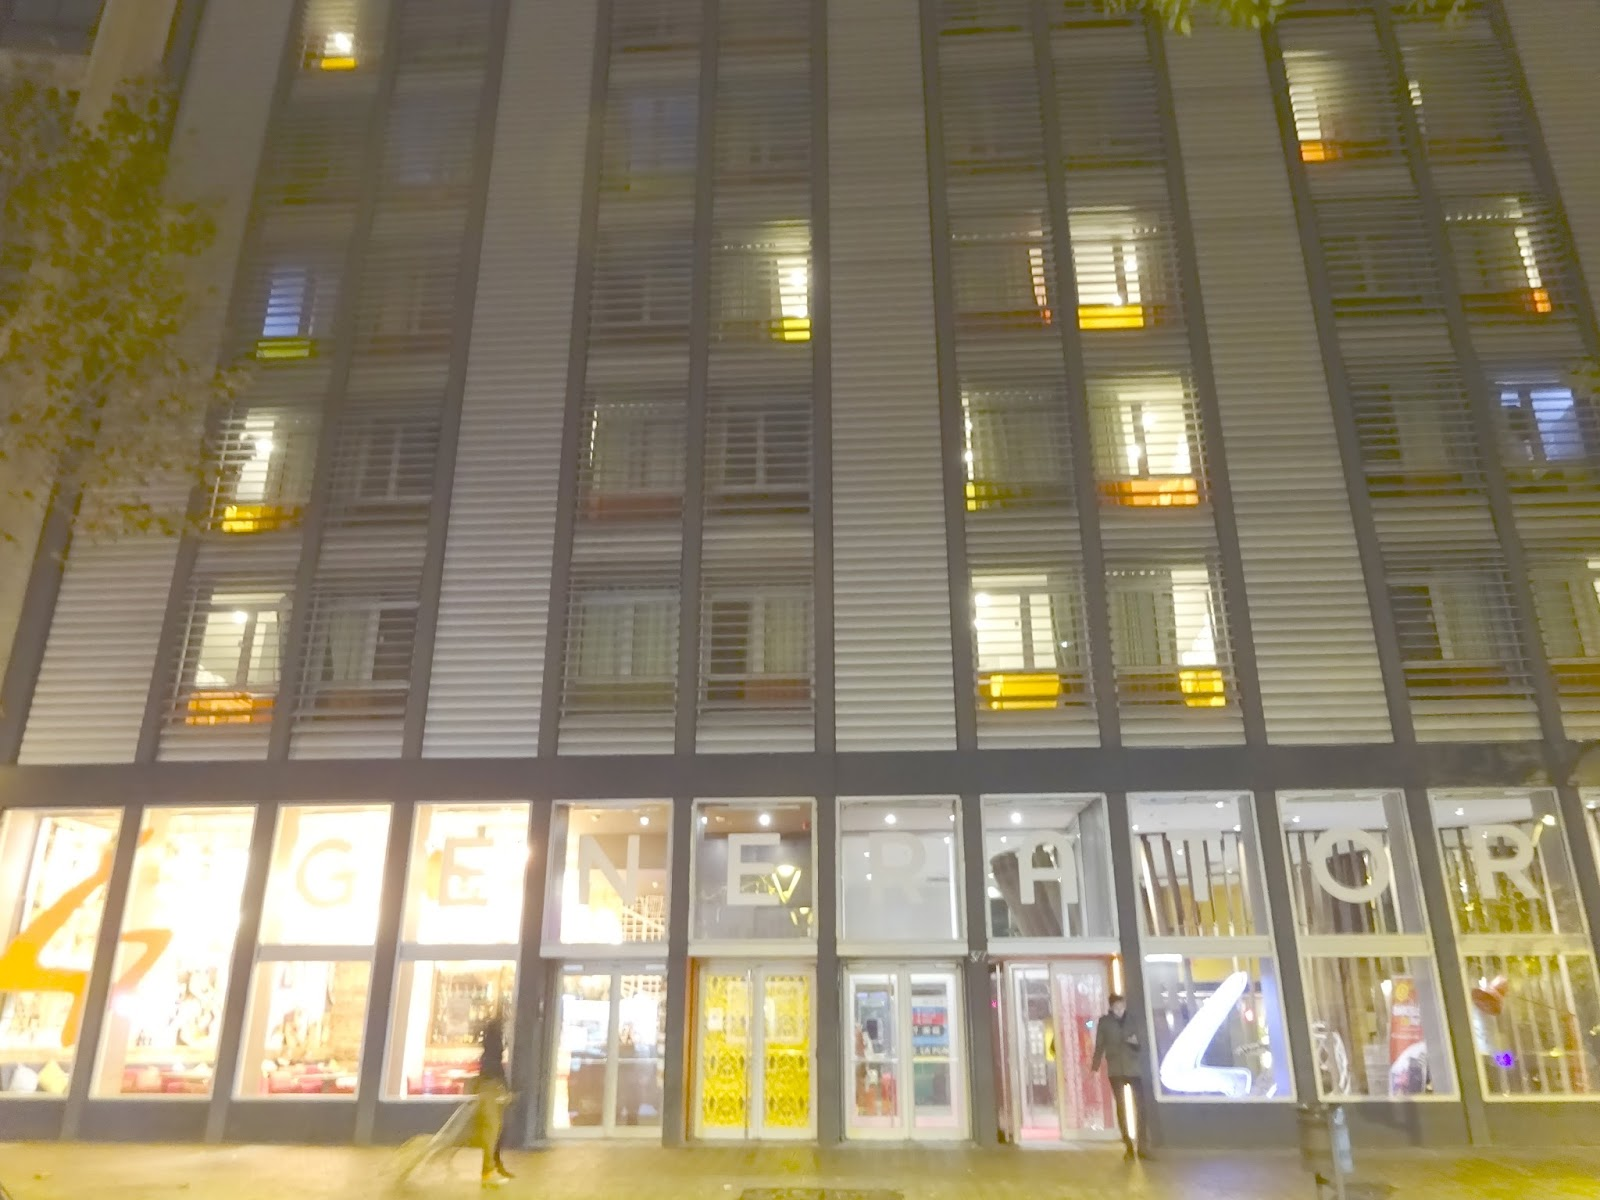 Estamostendenciados generator barcelona hotel de dise o for Design hotel lizum 1600